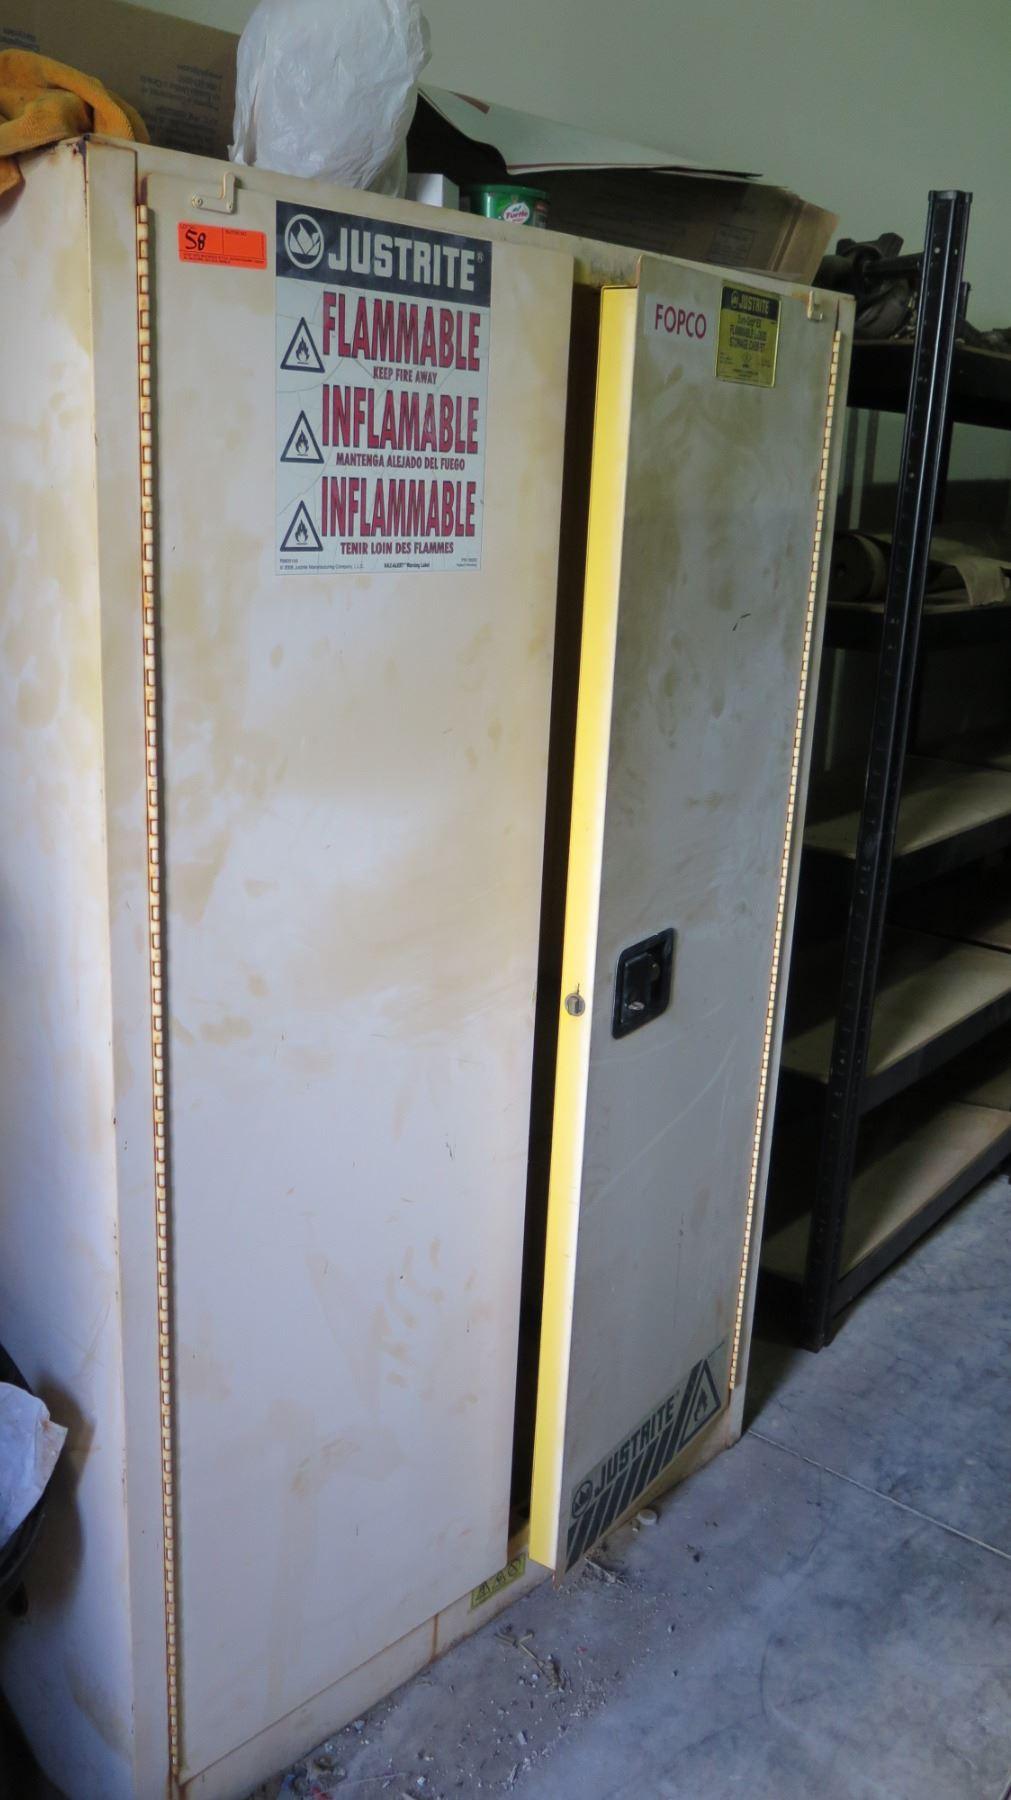 Justrite Sure-Grip EX Flammable Liquid Storage Cabinet ...